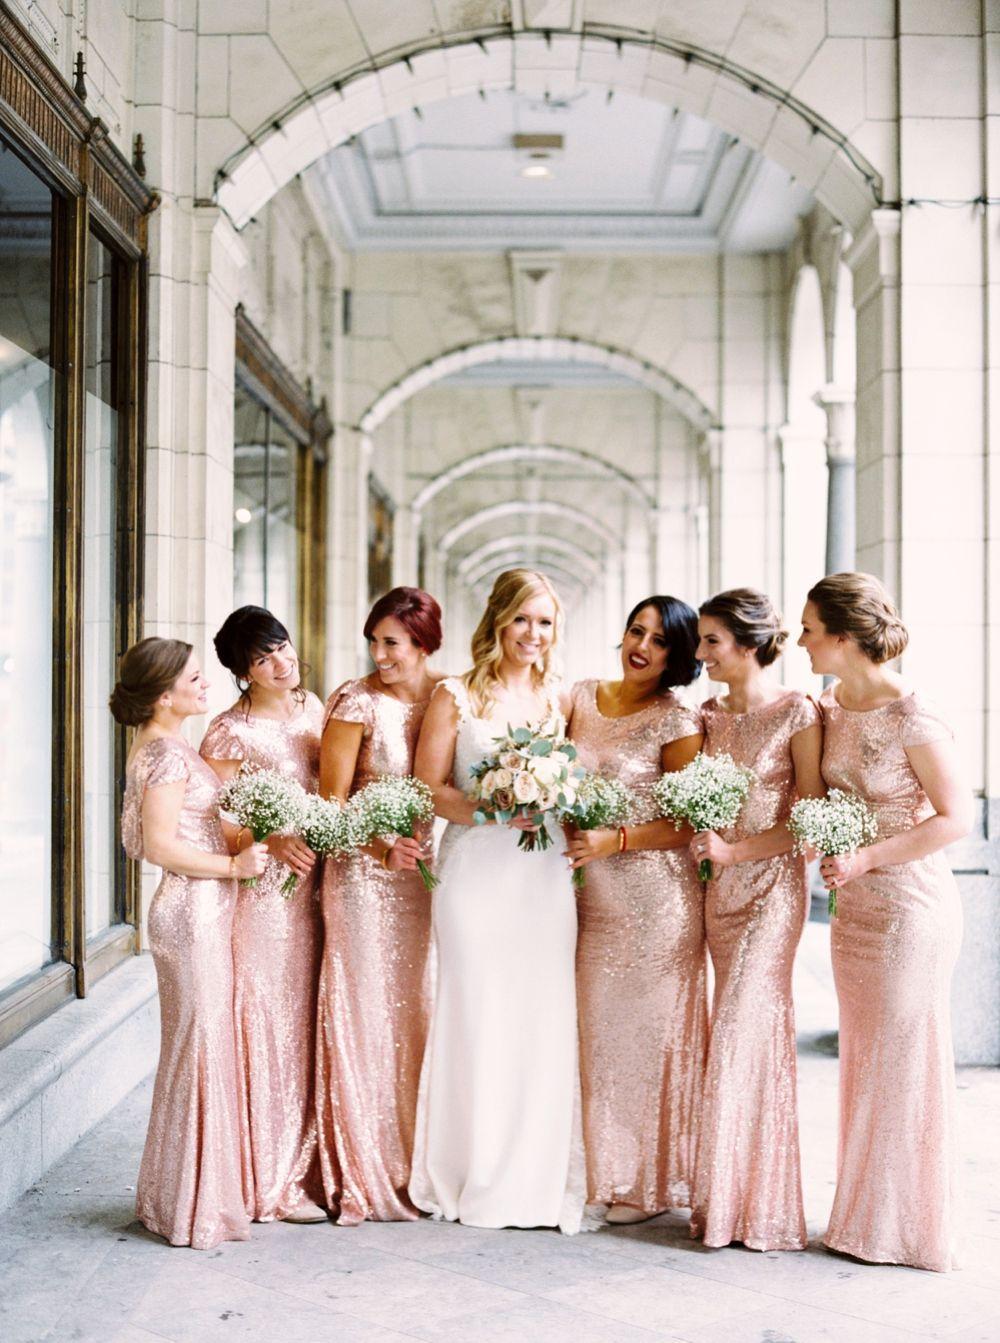 Rose Gold Sequin Bridesmaids Dresses Calgary Wedding Photographers Teatro Wedding New Ye Rose Gold Sequin Bridesmaid Dress Wedding New Years Eve Weddings